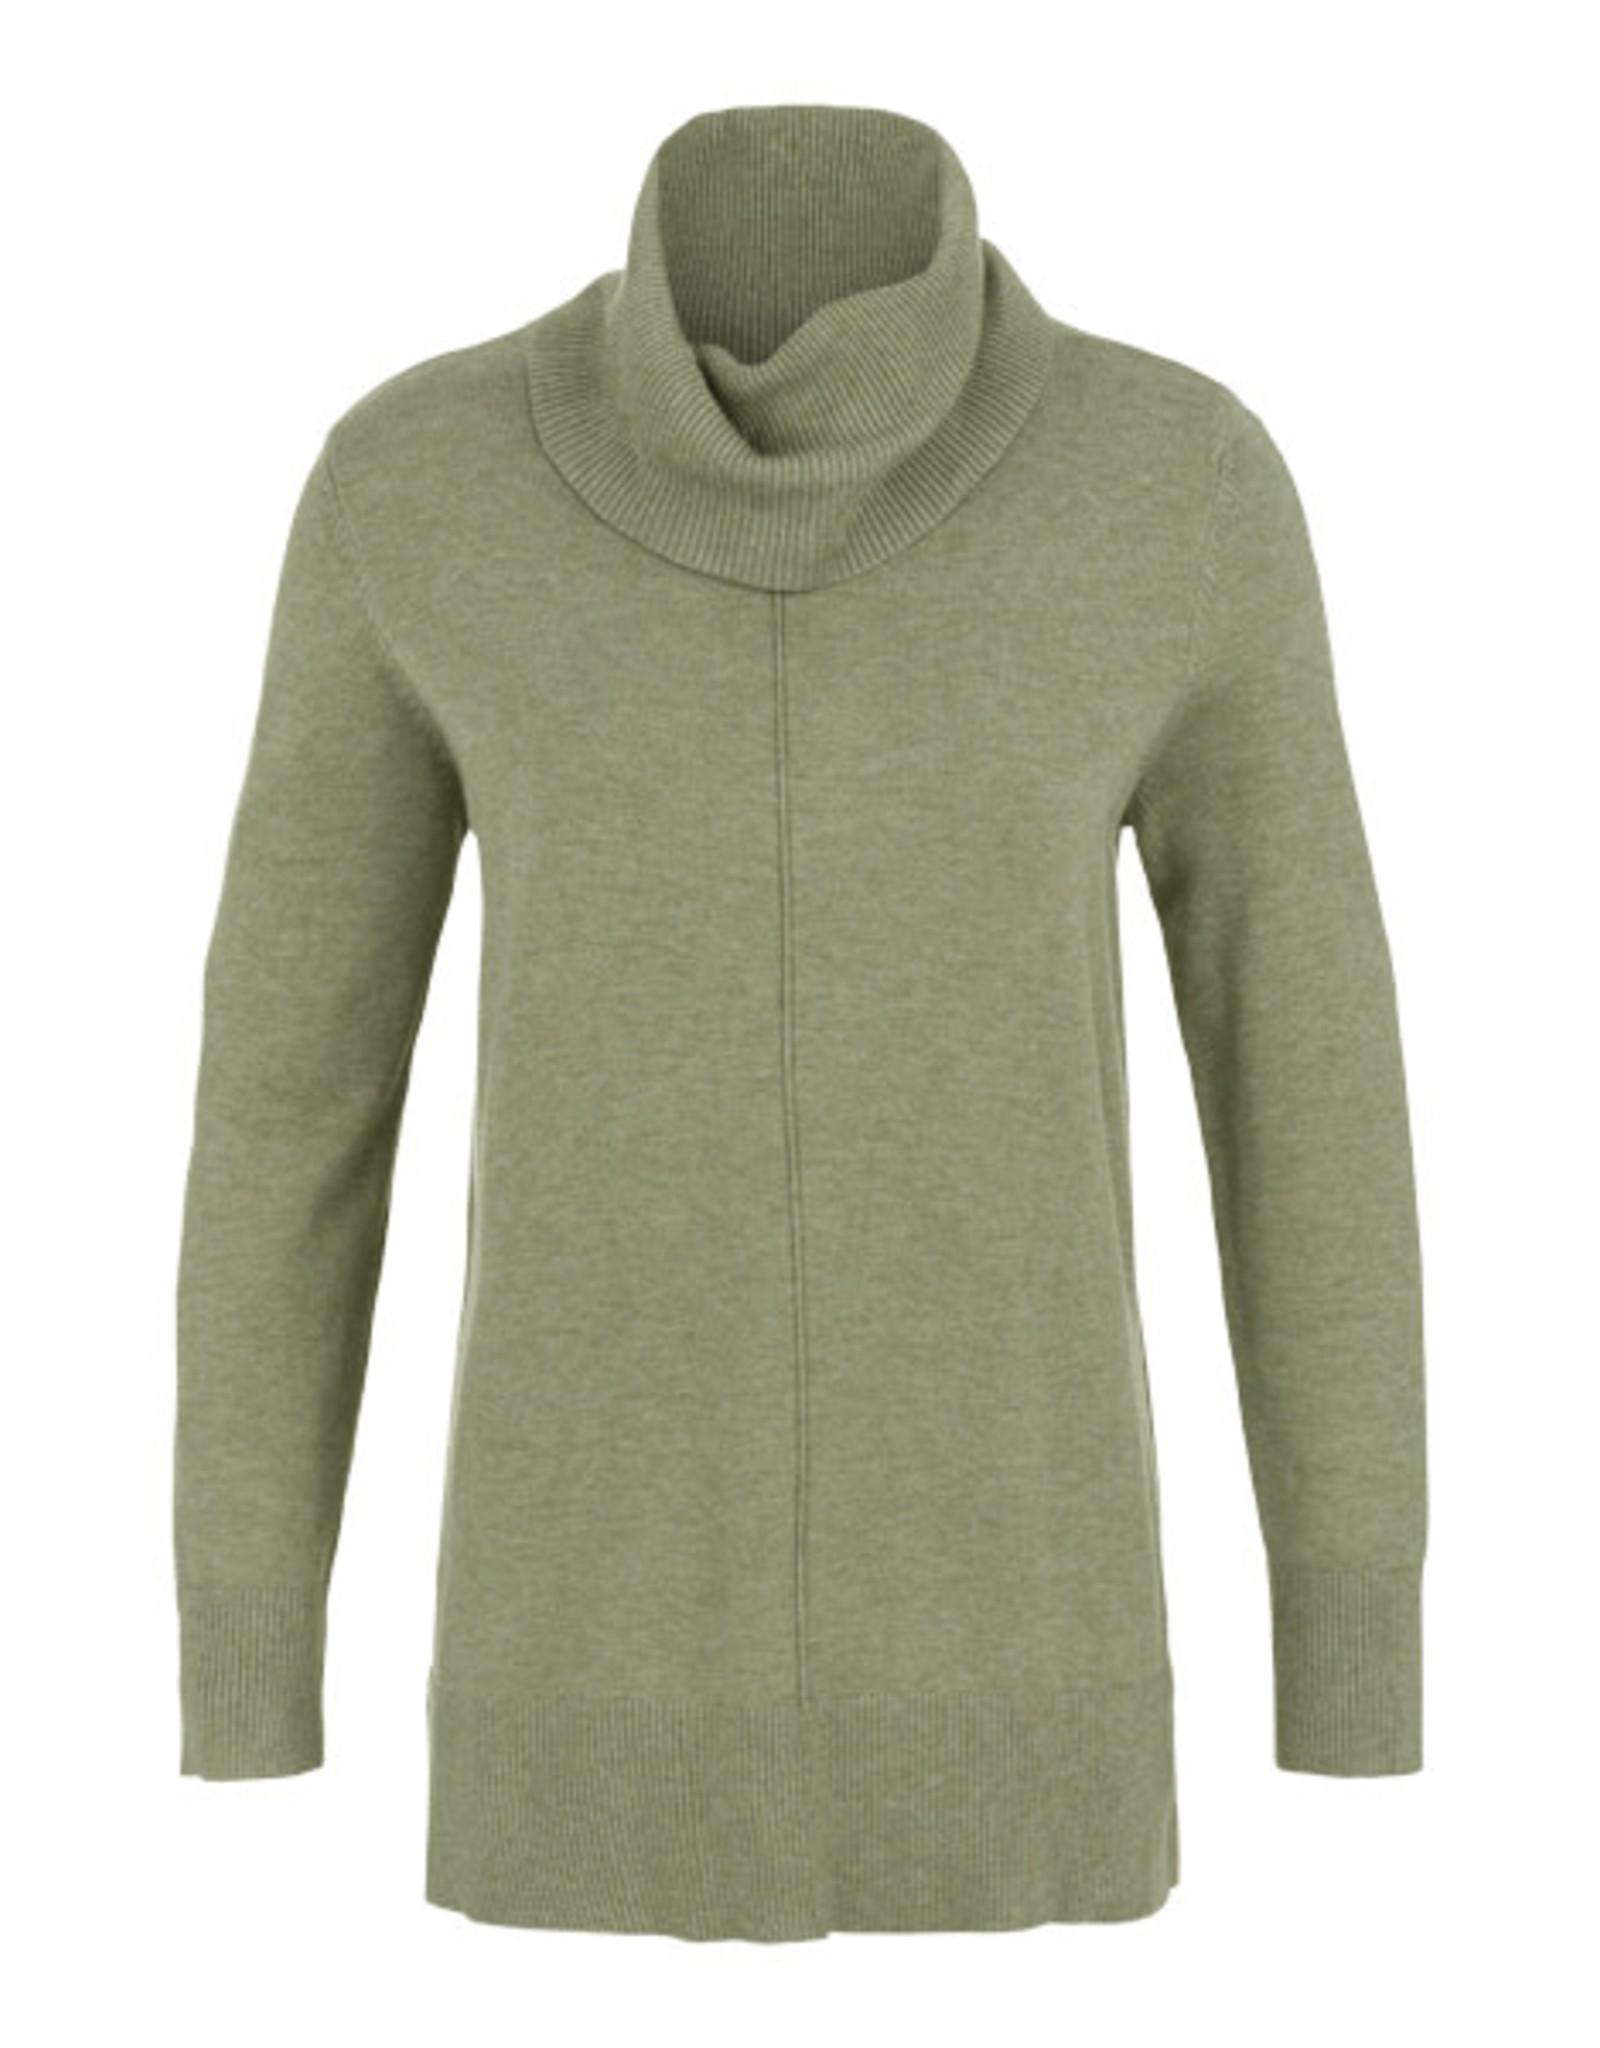 Tribal Tribal Long Cowlneck Sweater